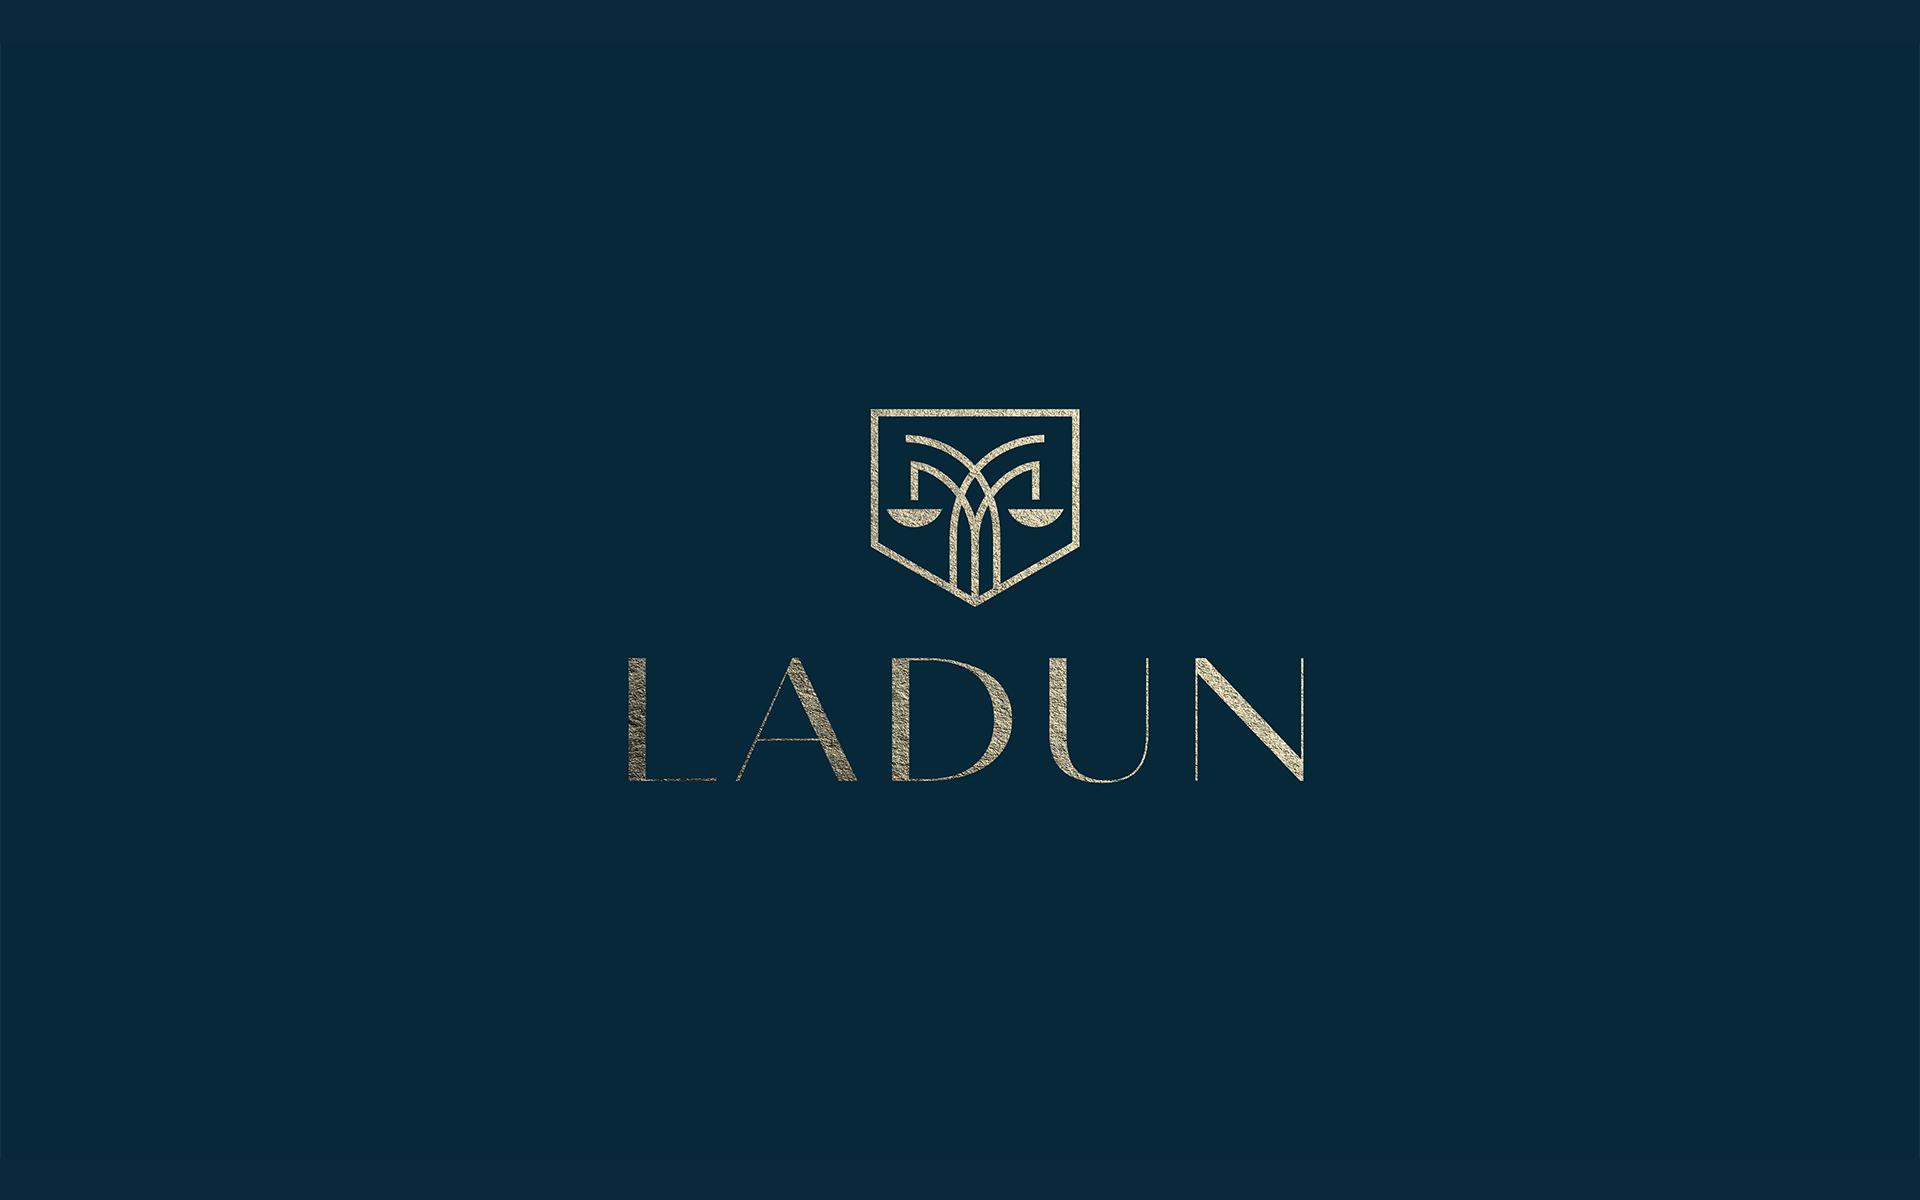 Abdelrahman Khaled Creates Ladun Brand Identity